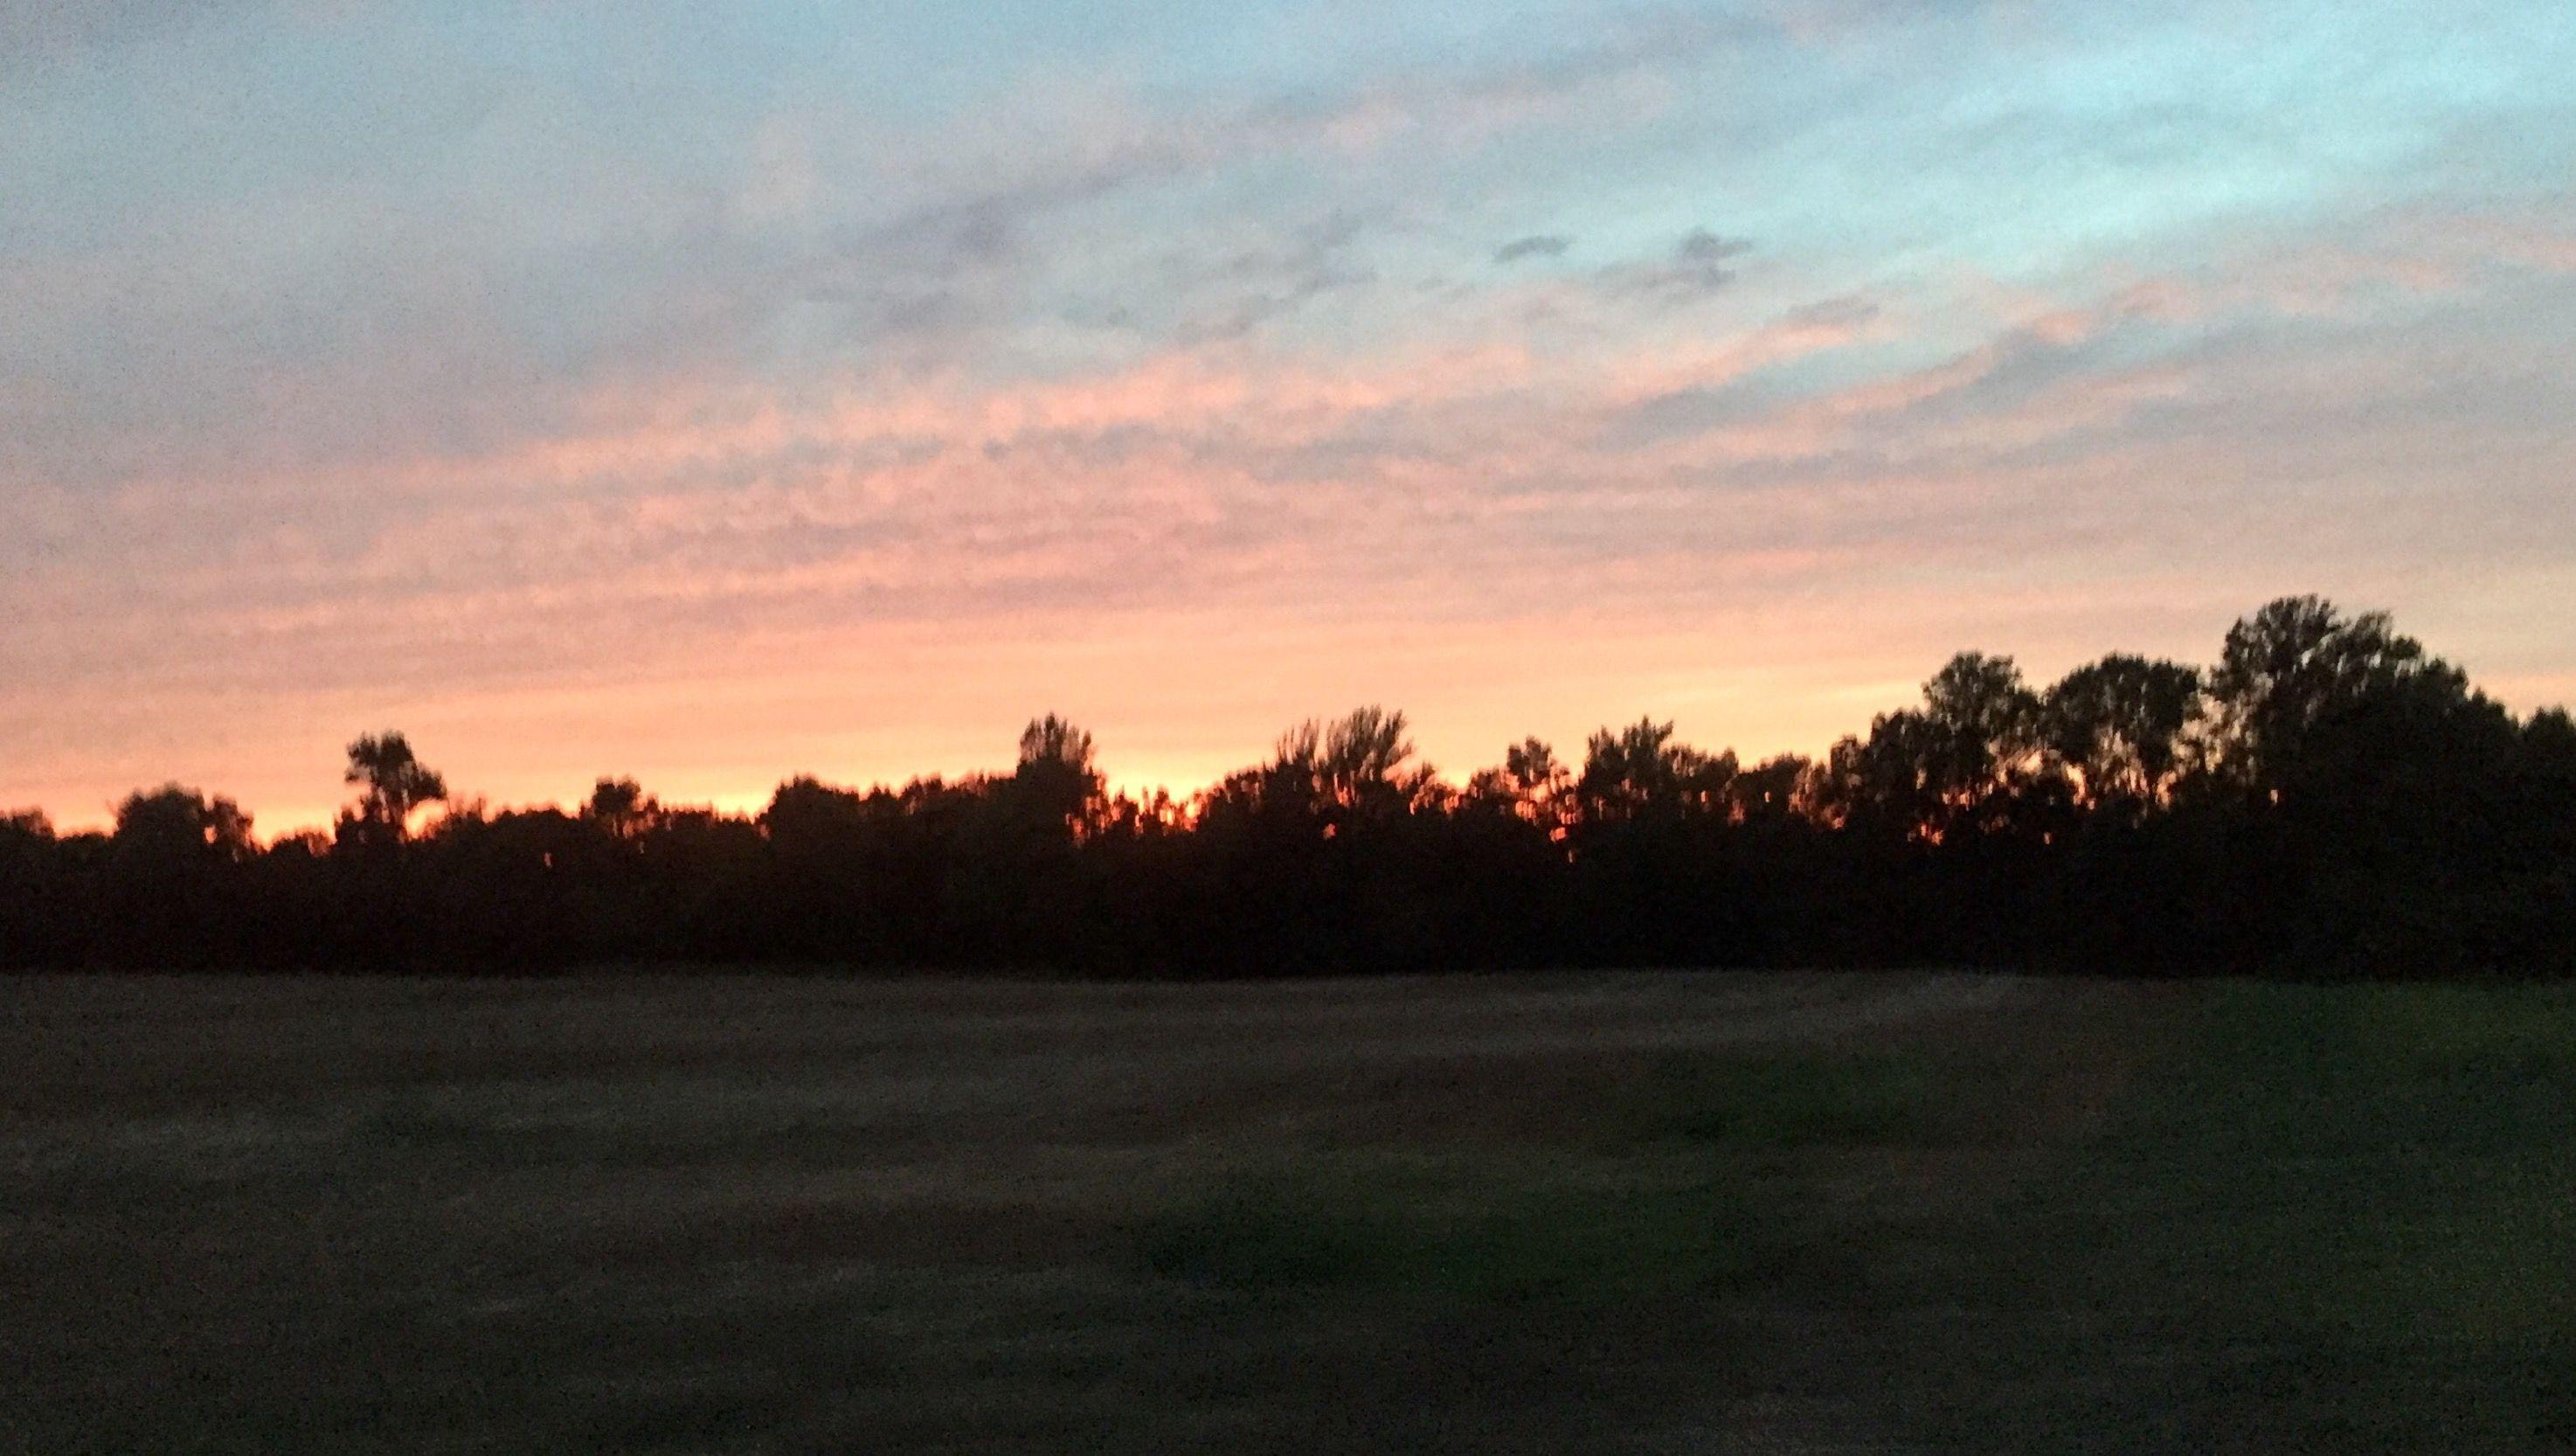 Sunset in Greensboro, MD 🌅 Trip, Photo